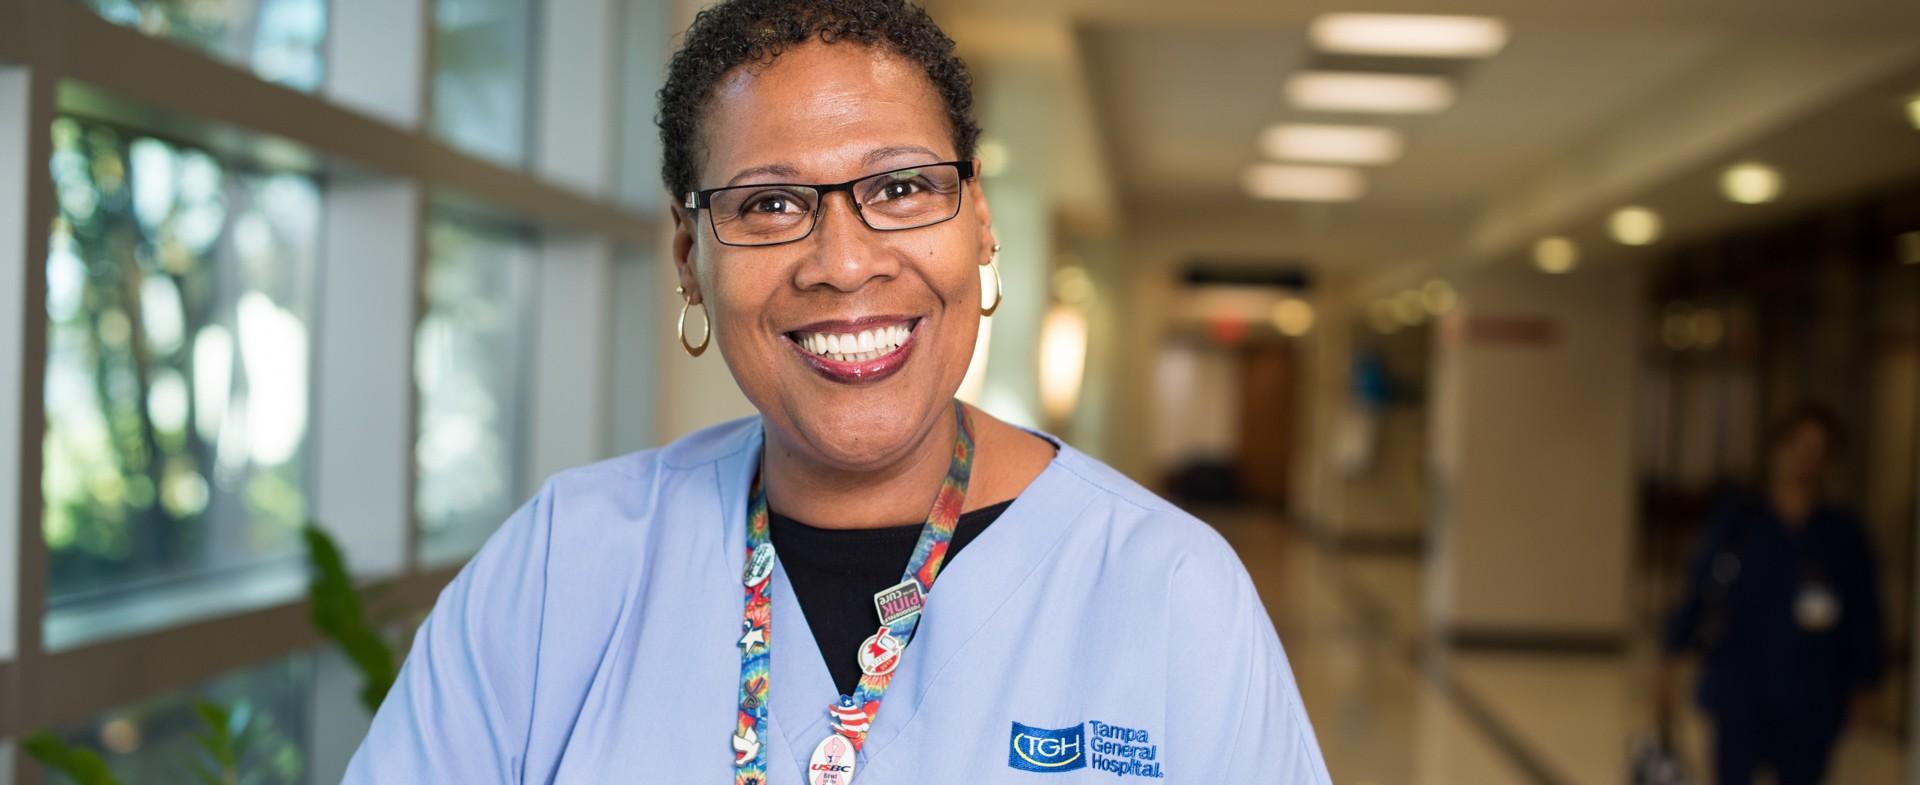 A smiling nurse at Tampa General Hospital